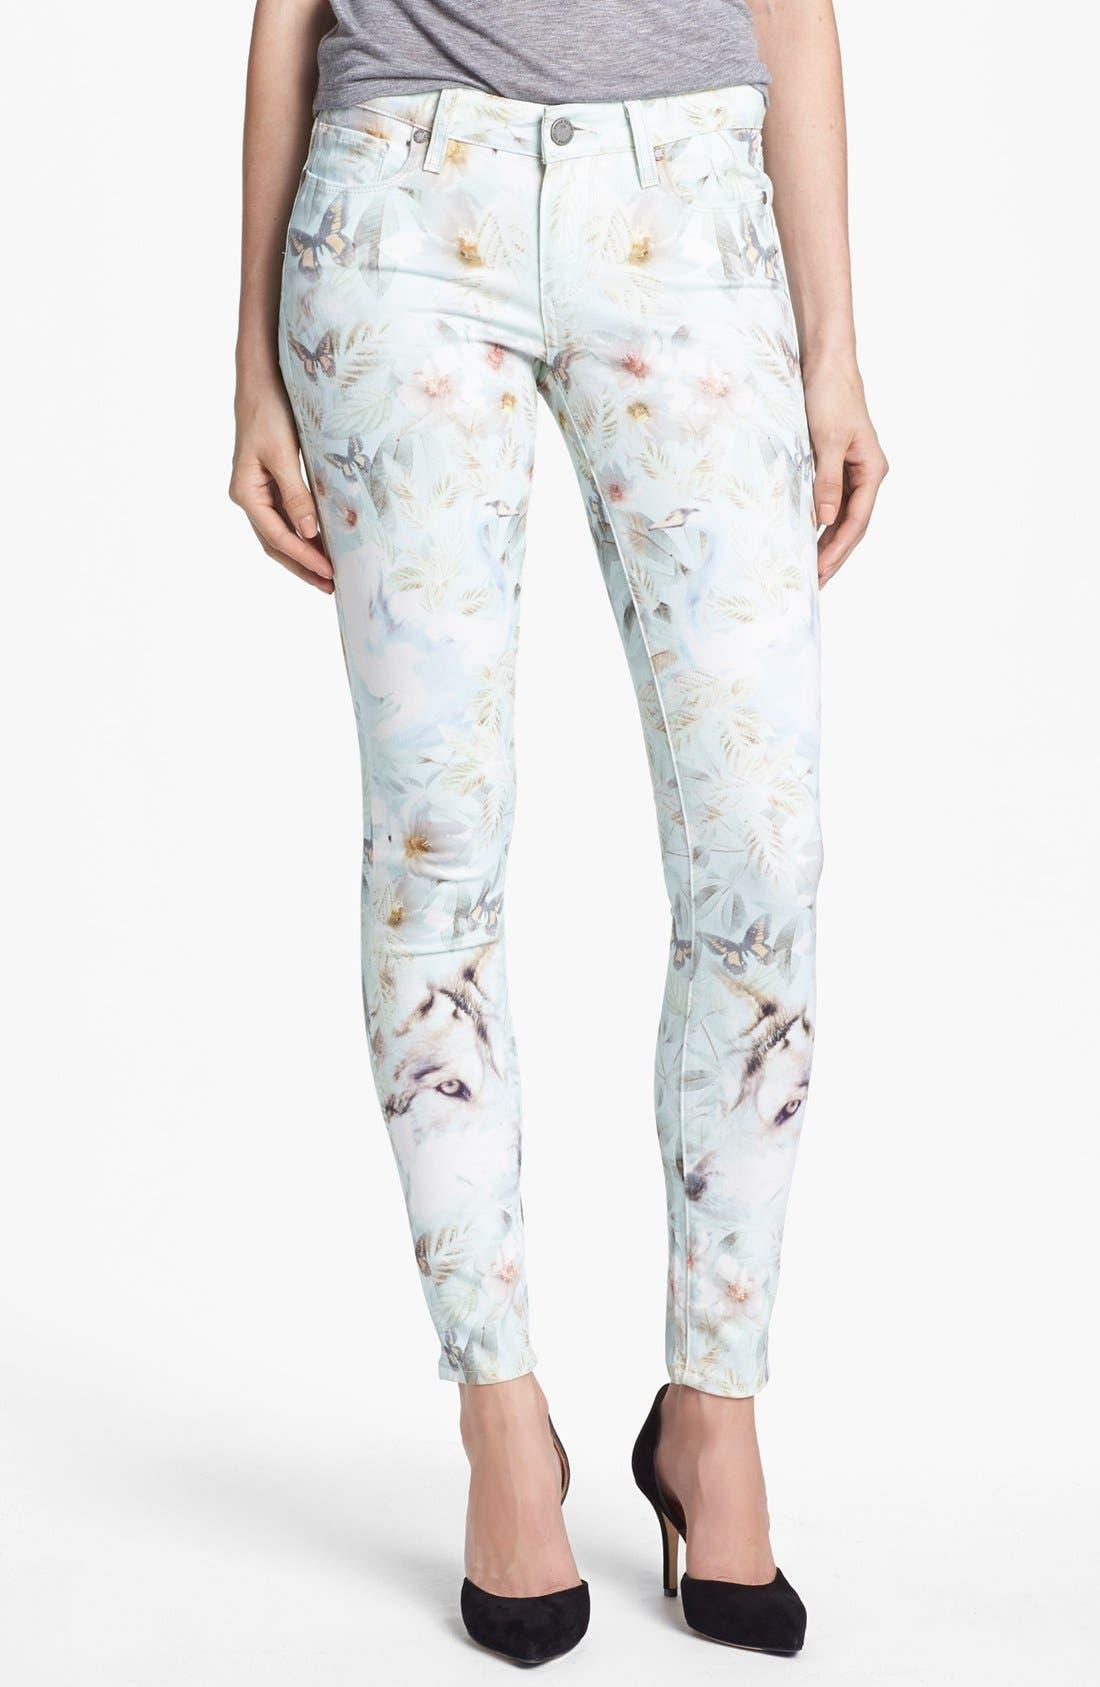 Alternate Image 1 Selected - Paige Denim 'Verdugo' Print Ultra Skinny Jeans (Grey Wind)